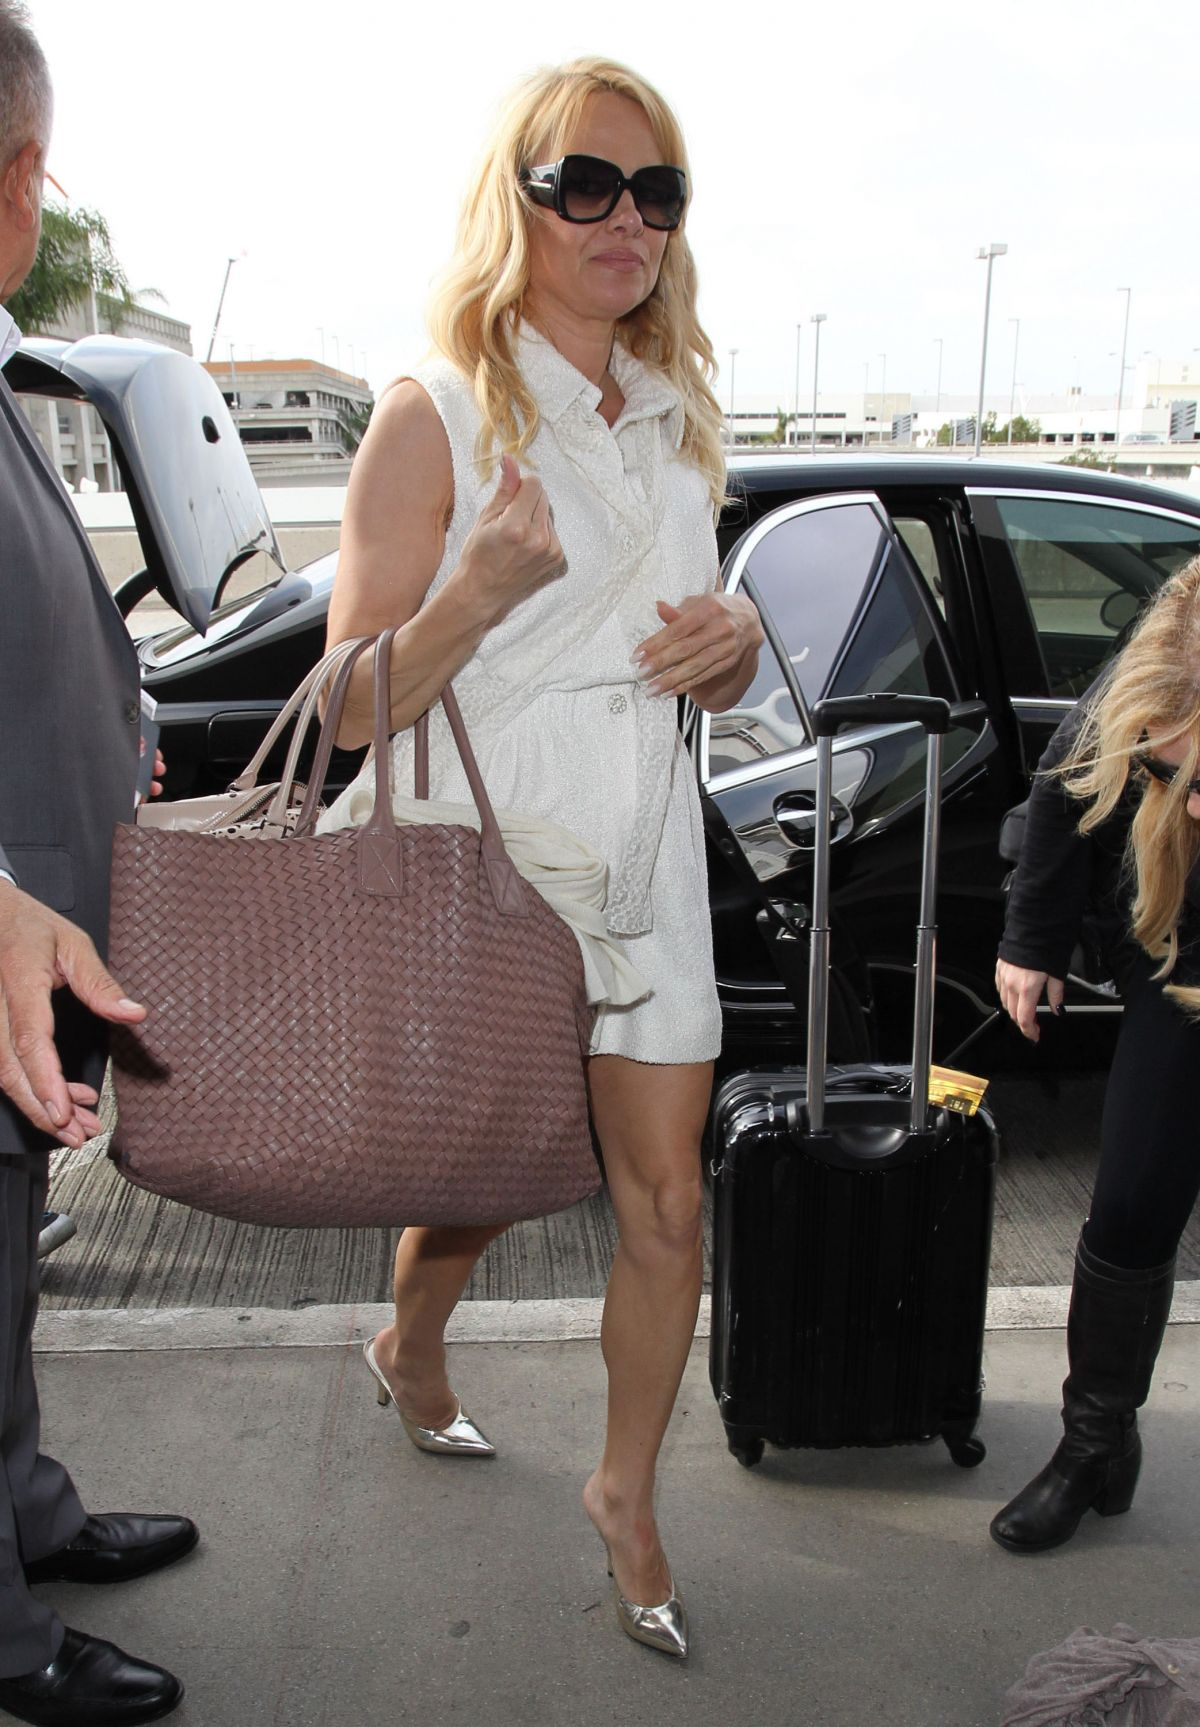 bra Paparazzi Pamela Anderson naked photo 2017